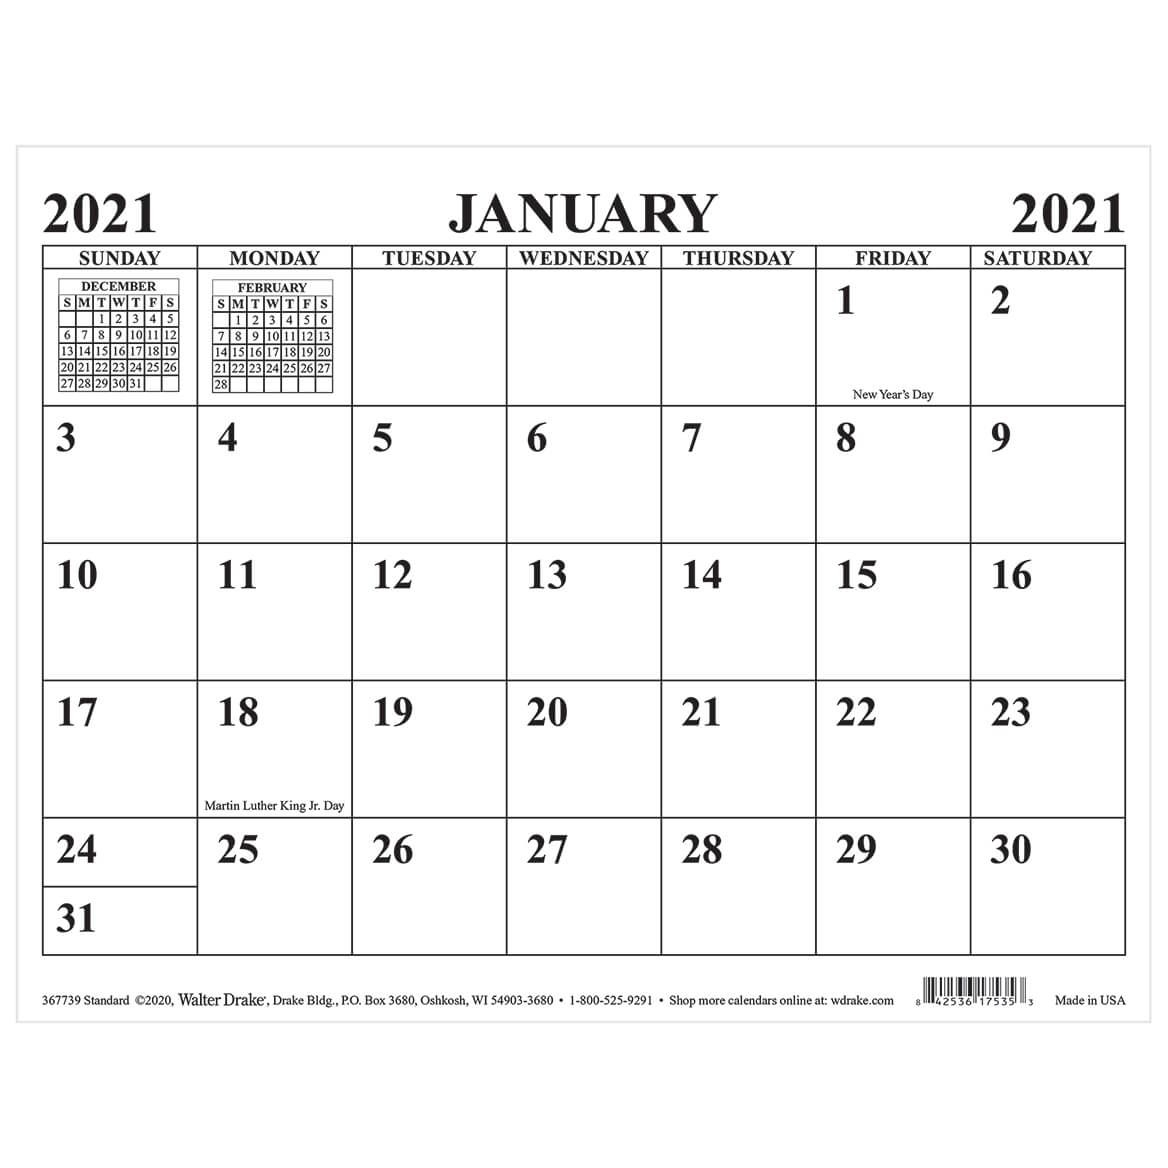 Standard Magnetic Calendar